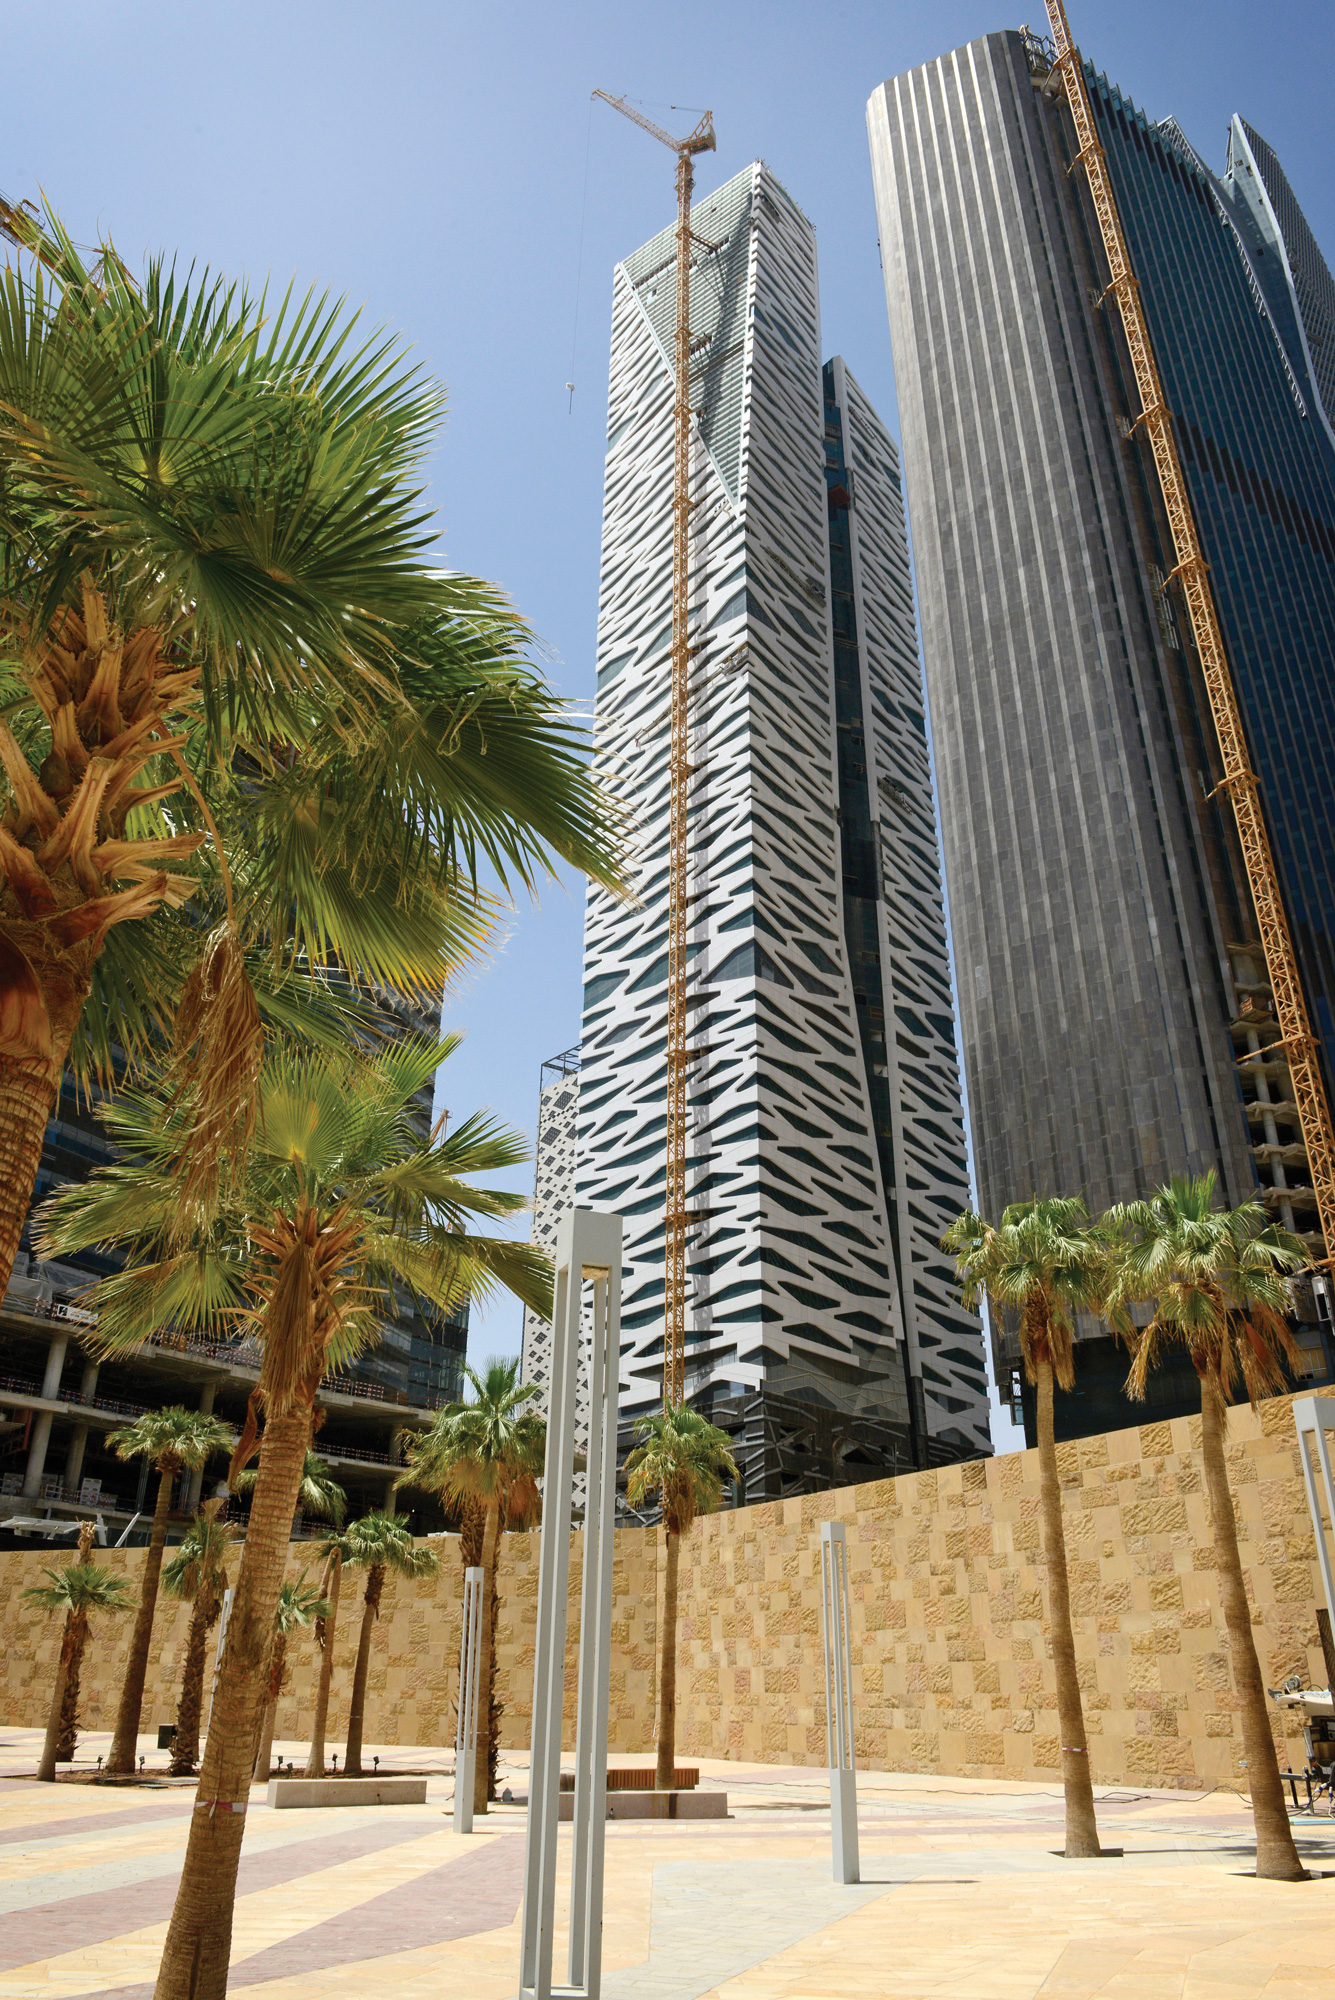 KAFD World Trade Centre, Saudi Arabia - BFG Architecture